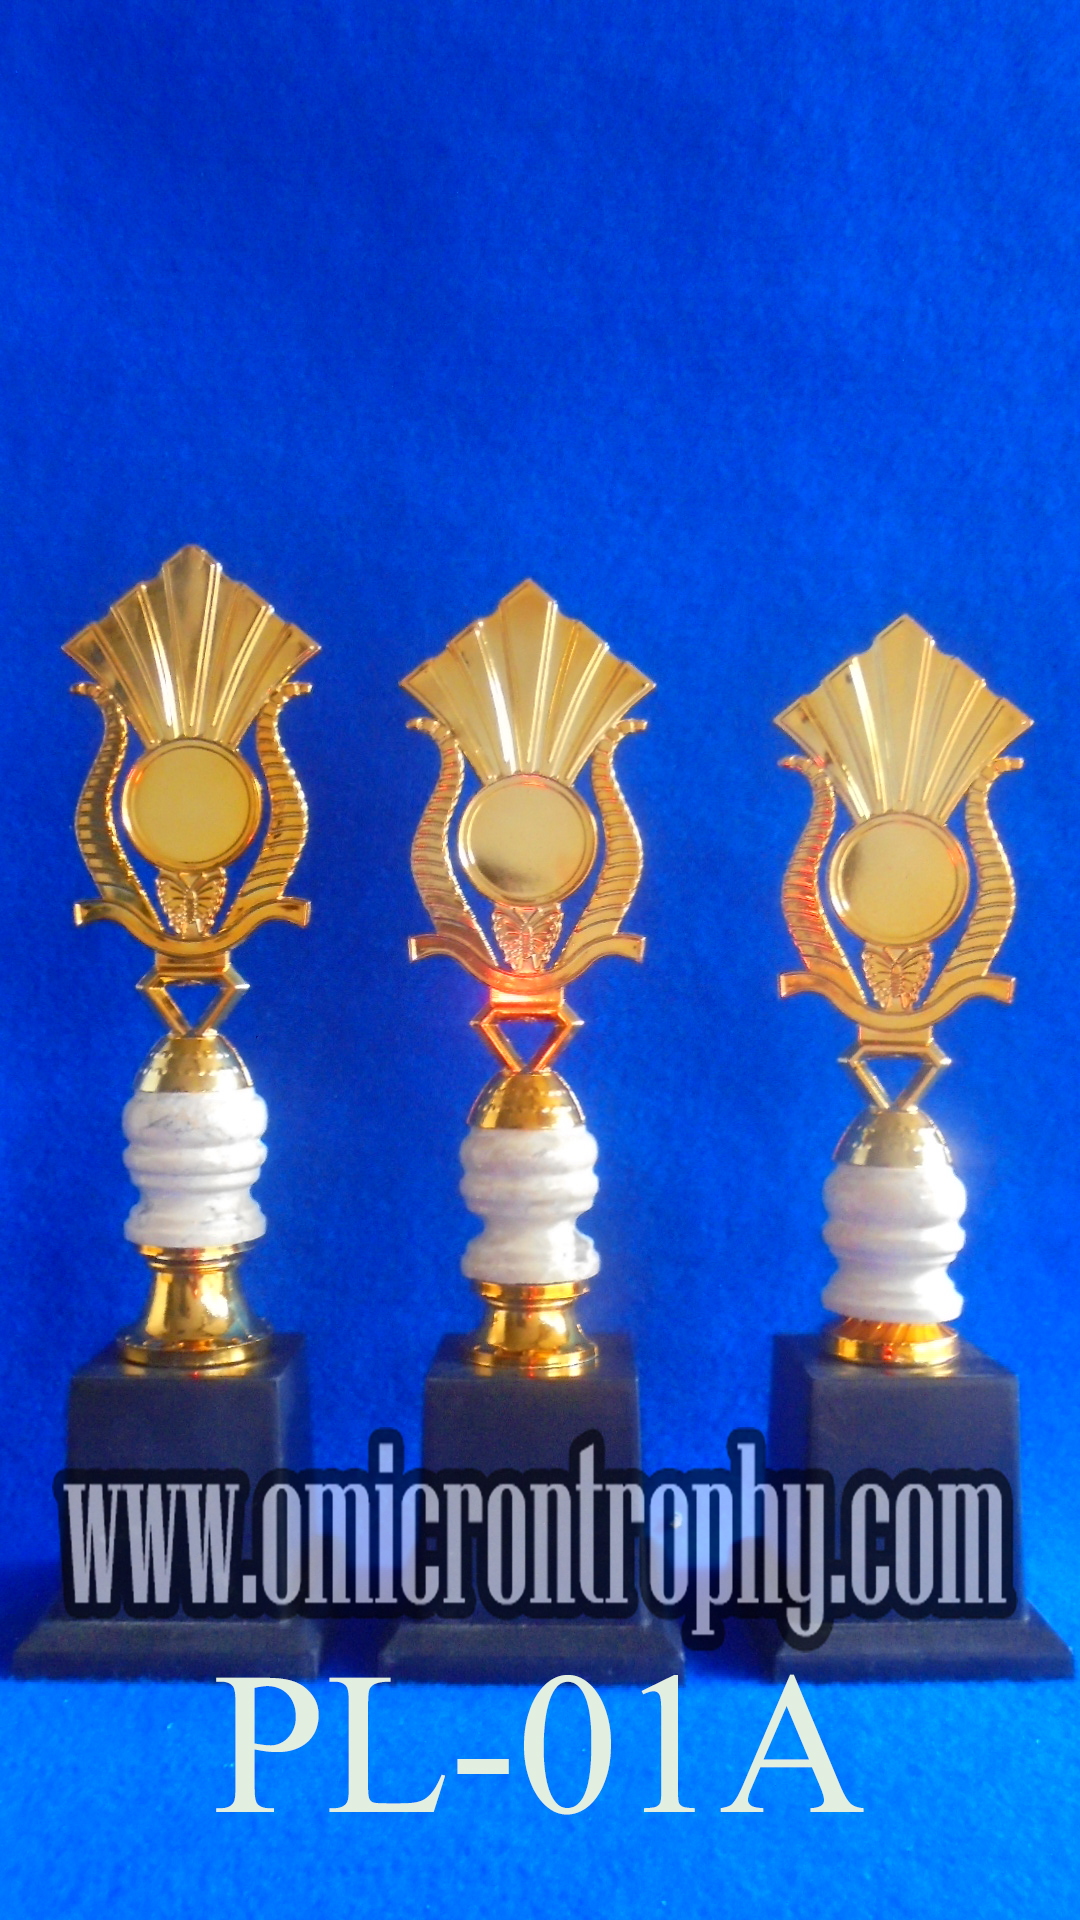 Agen Jual Piala Trophy Marmer Murah-PL-01A